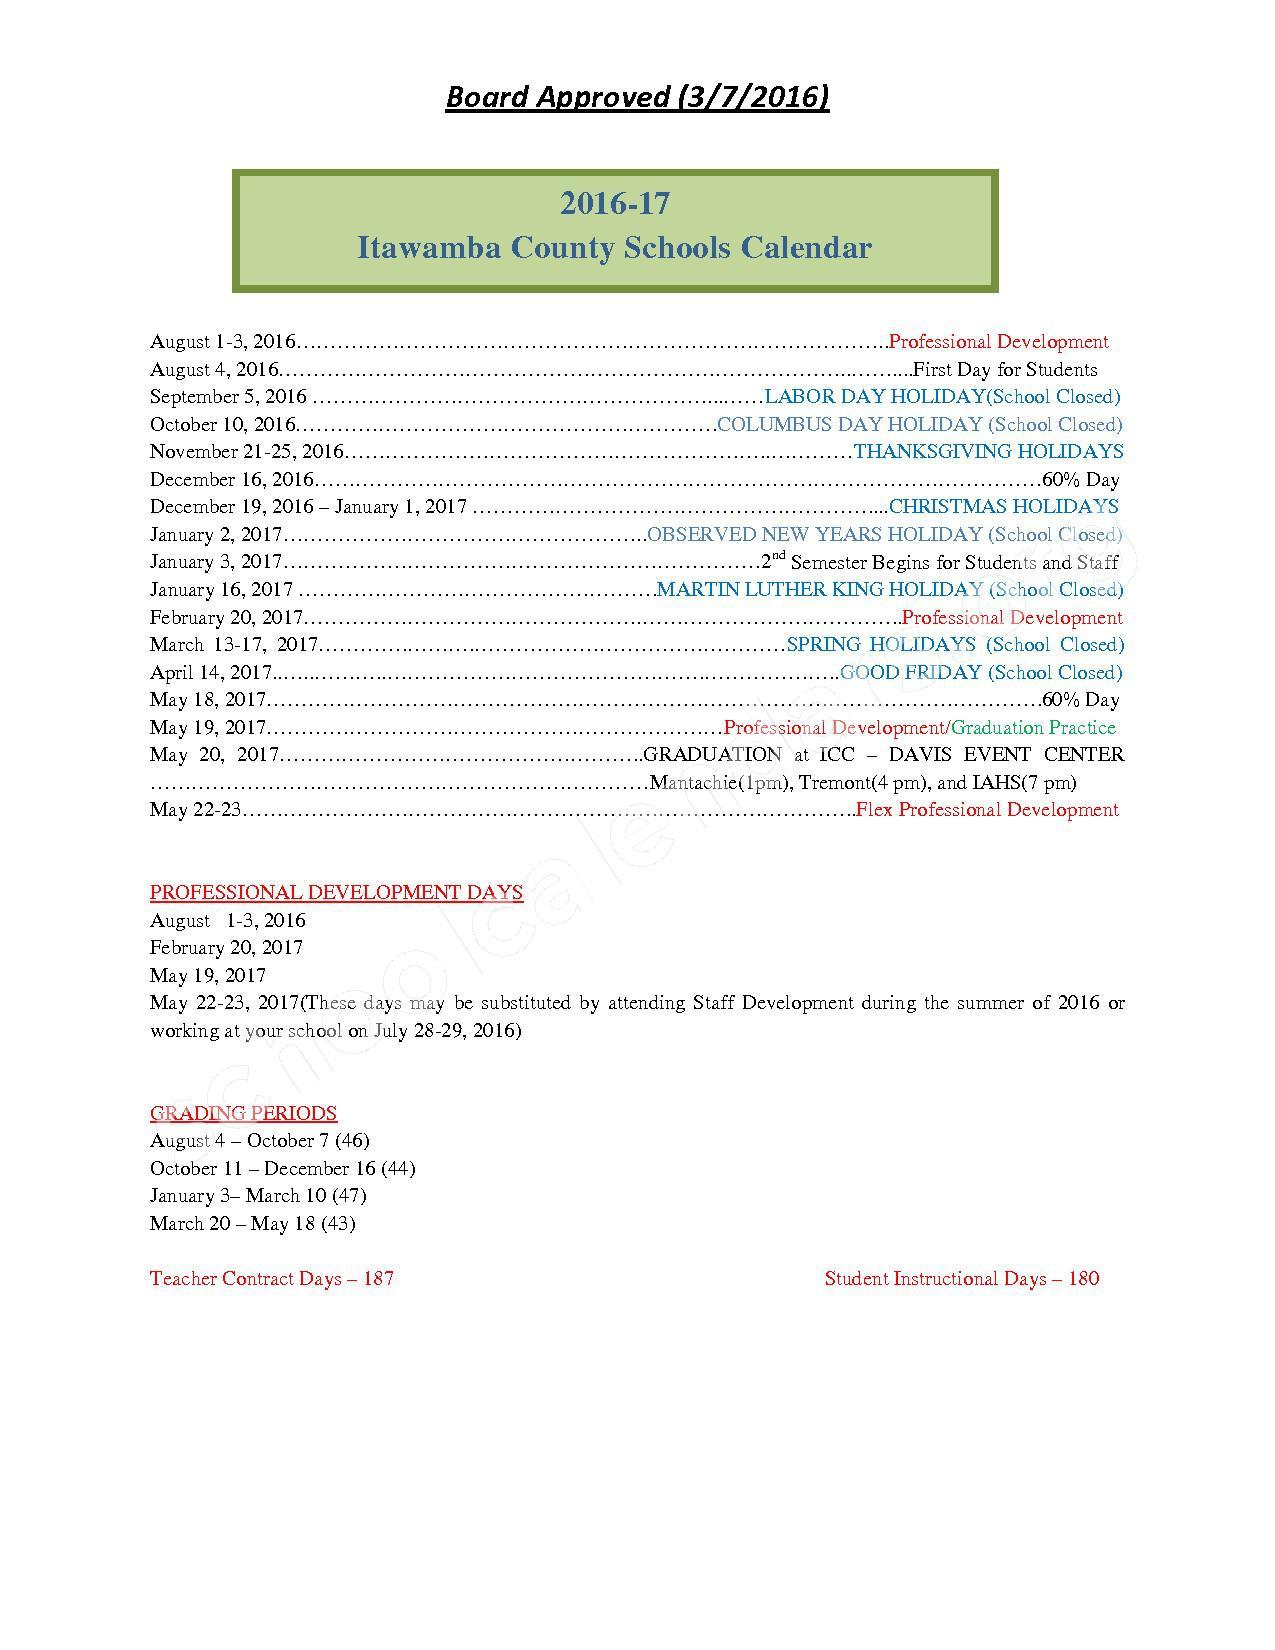 2016 - 2017 School Calendar – Itawamba County School District – page 1